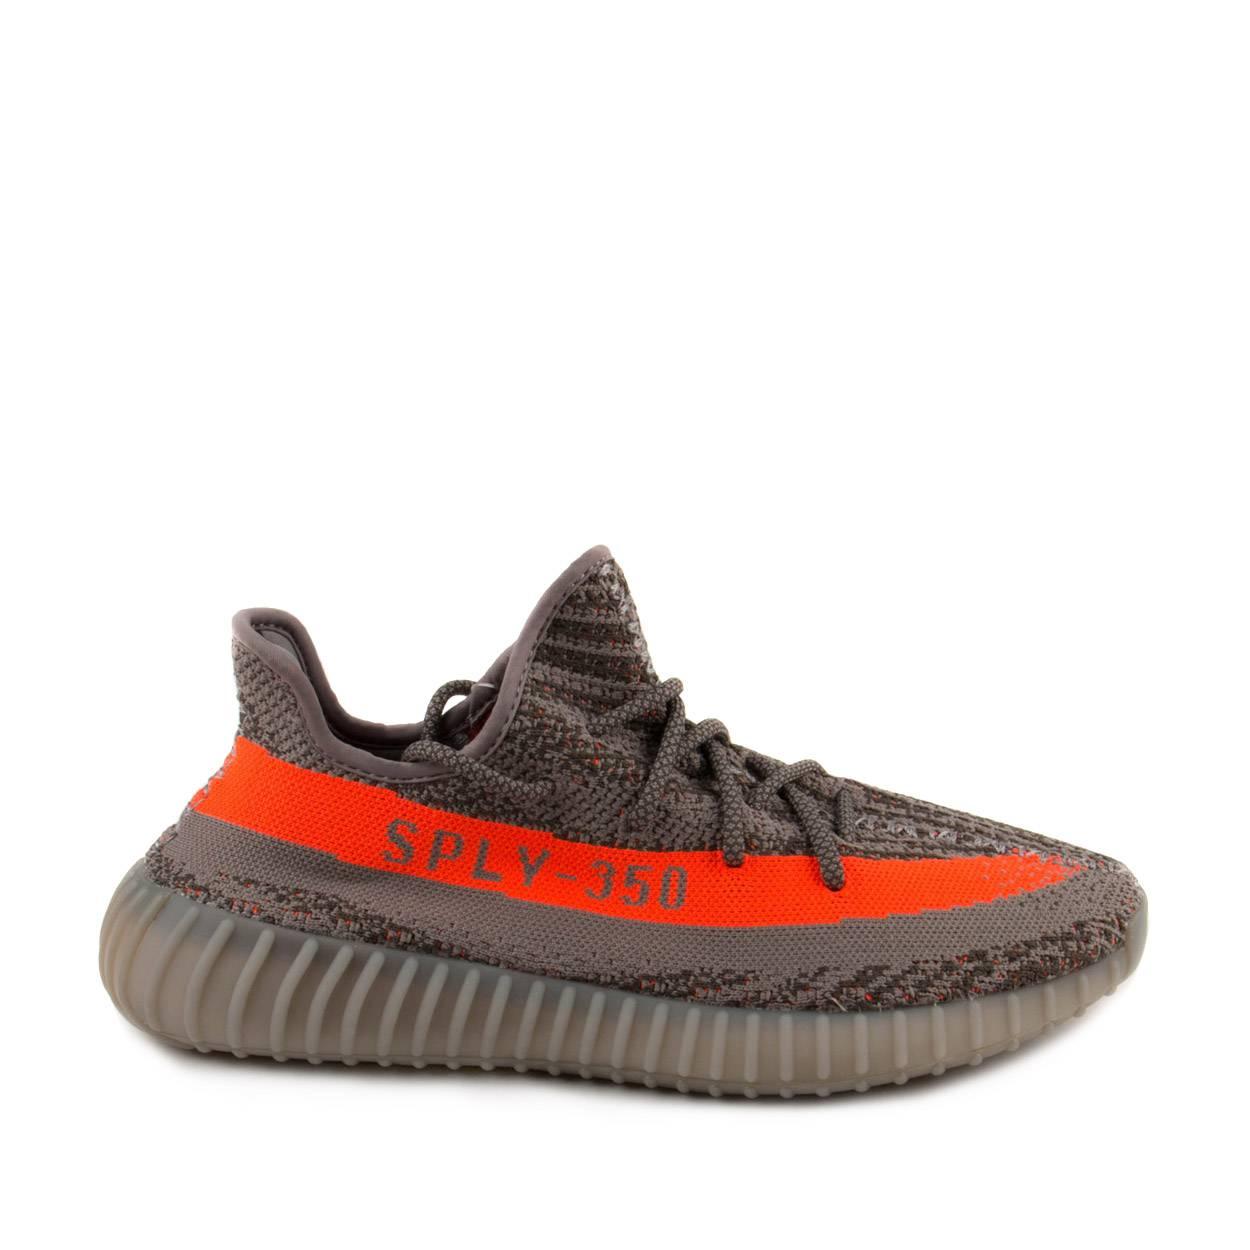 2c0987608a889 Adidas Mens Yeezy Boost 350 V2